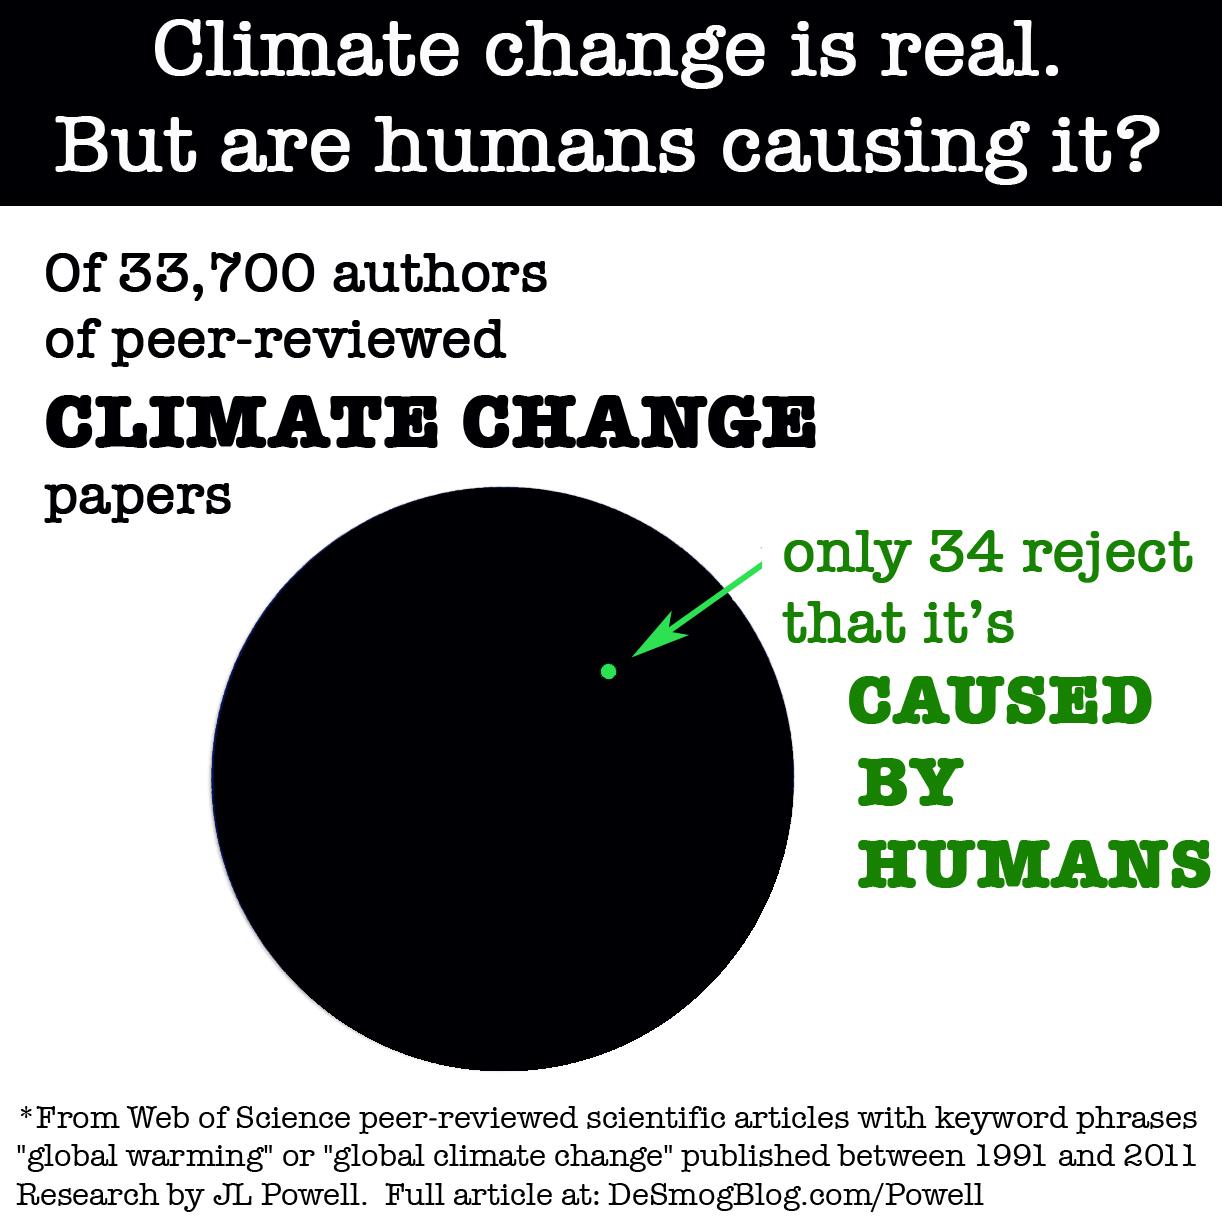 climatecircles